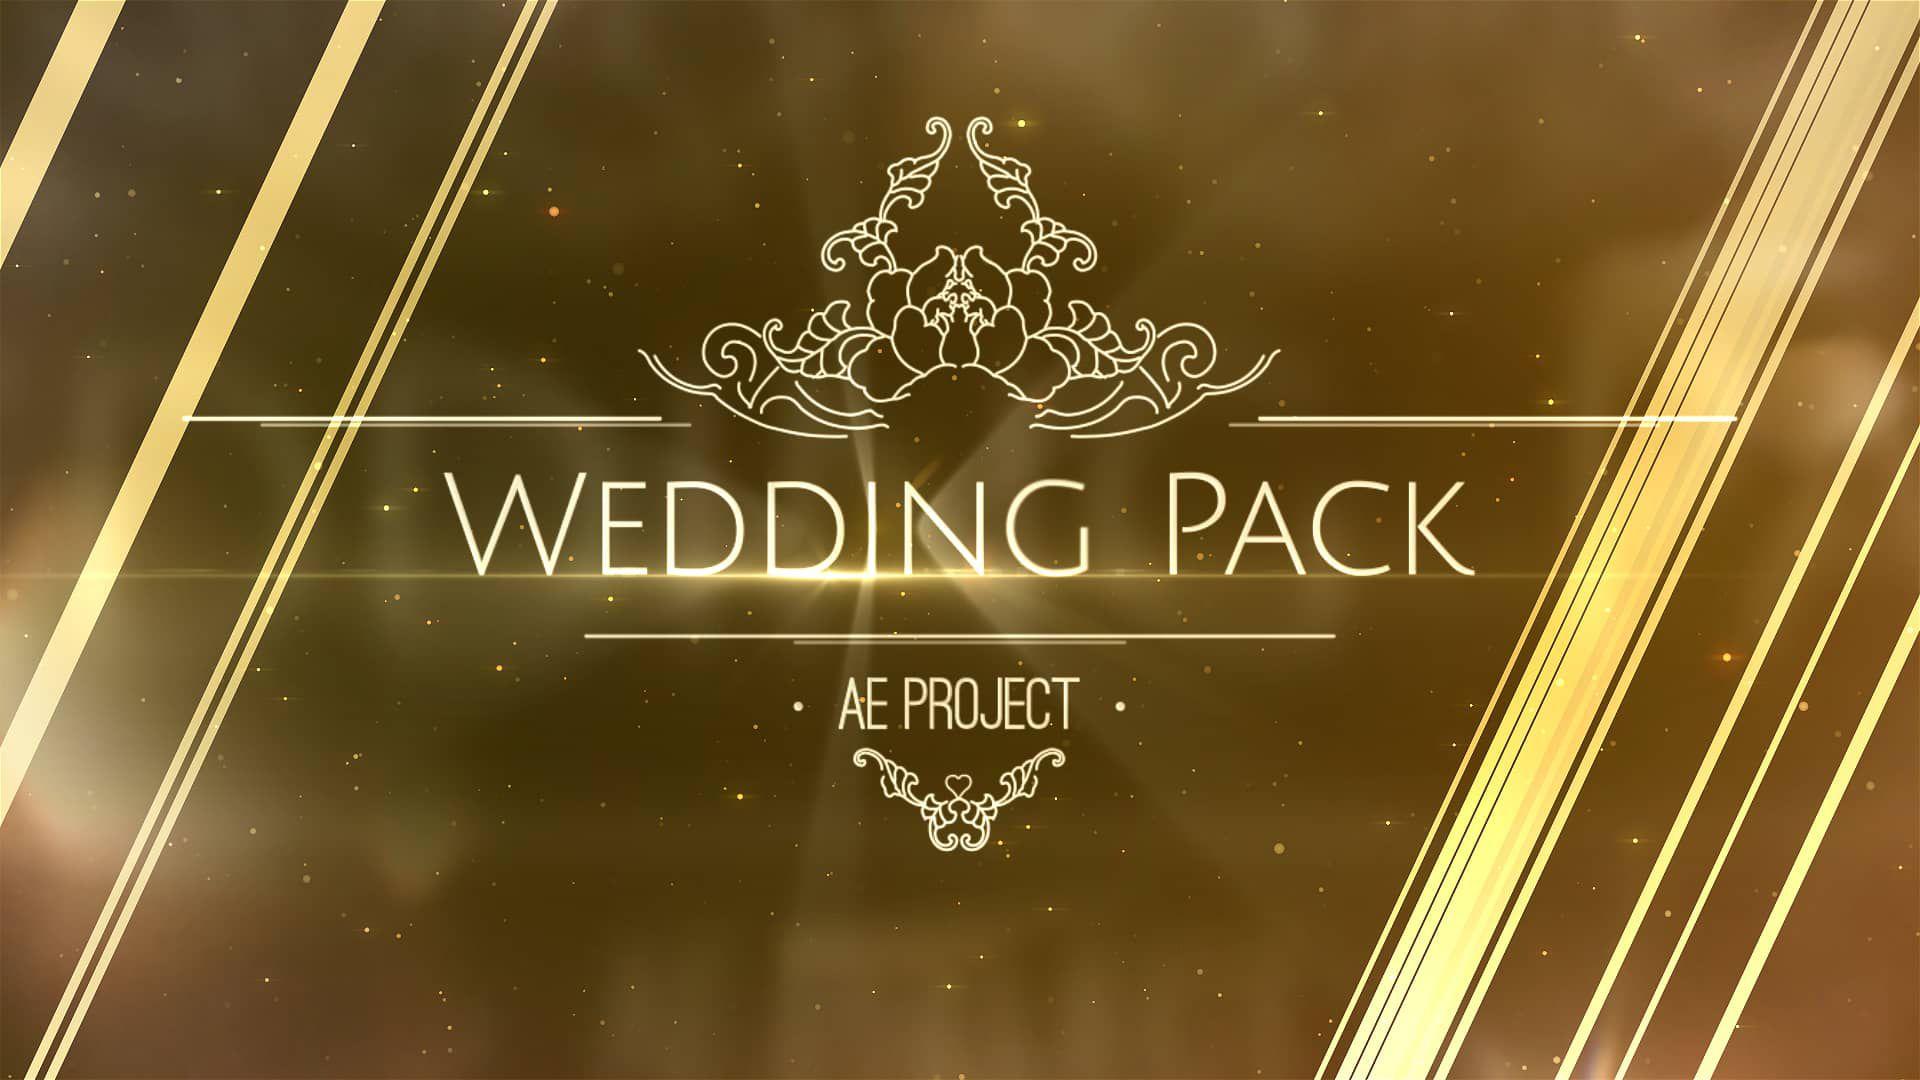 003 Impressive After Effect Wedding Template Design  Templates Free Download Cc InvitationFull